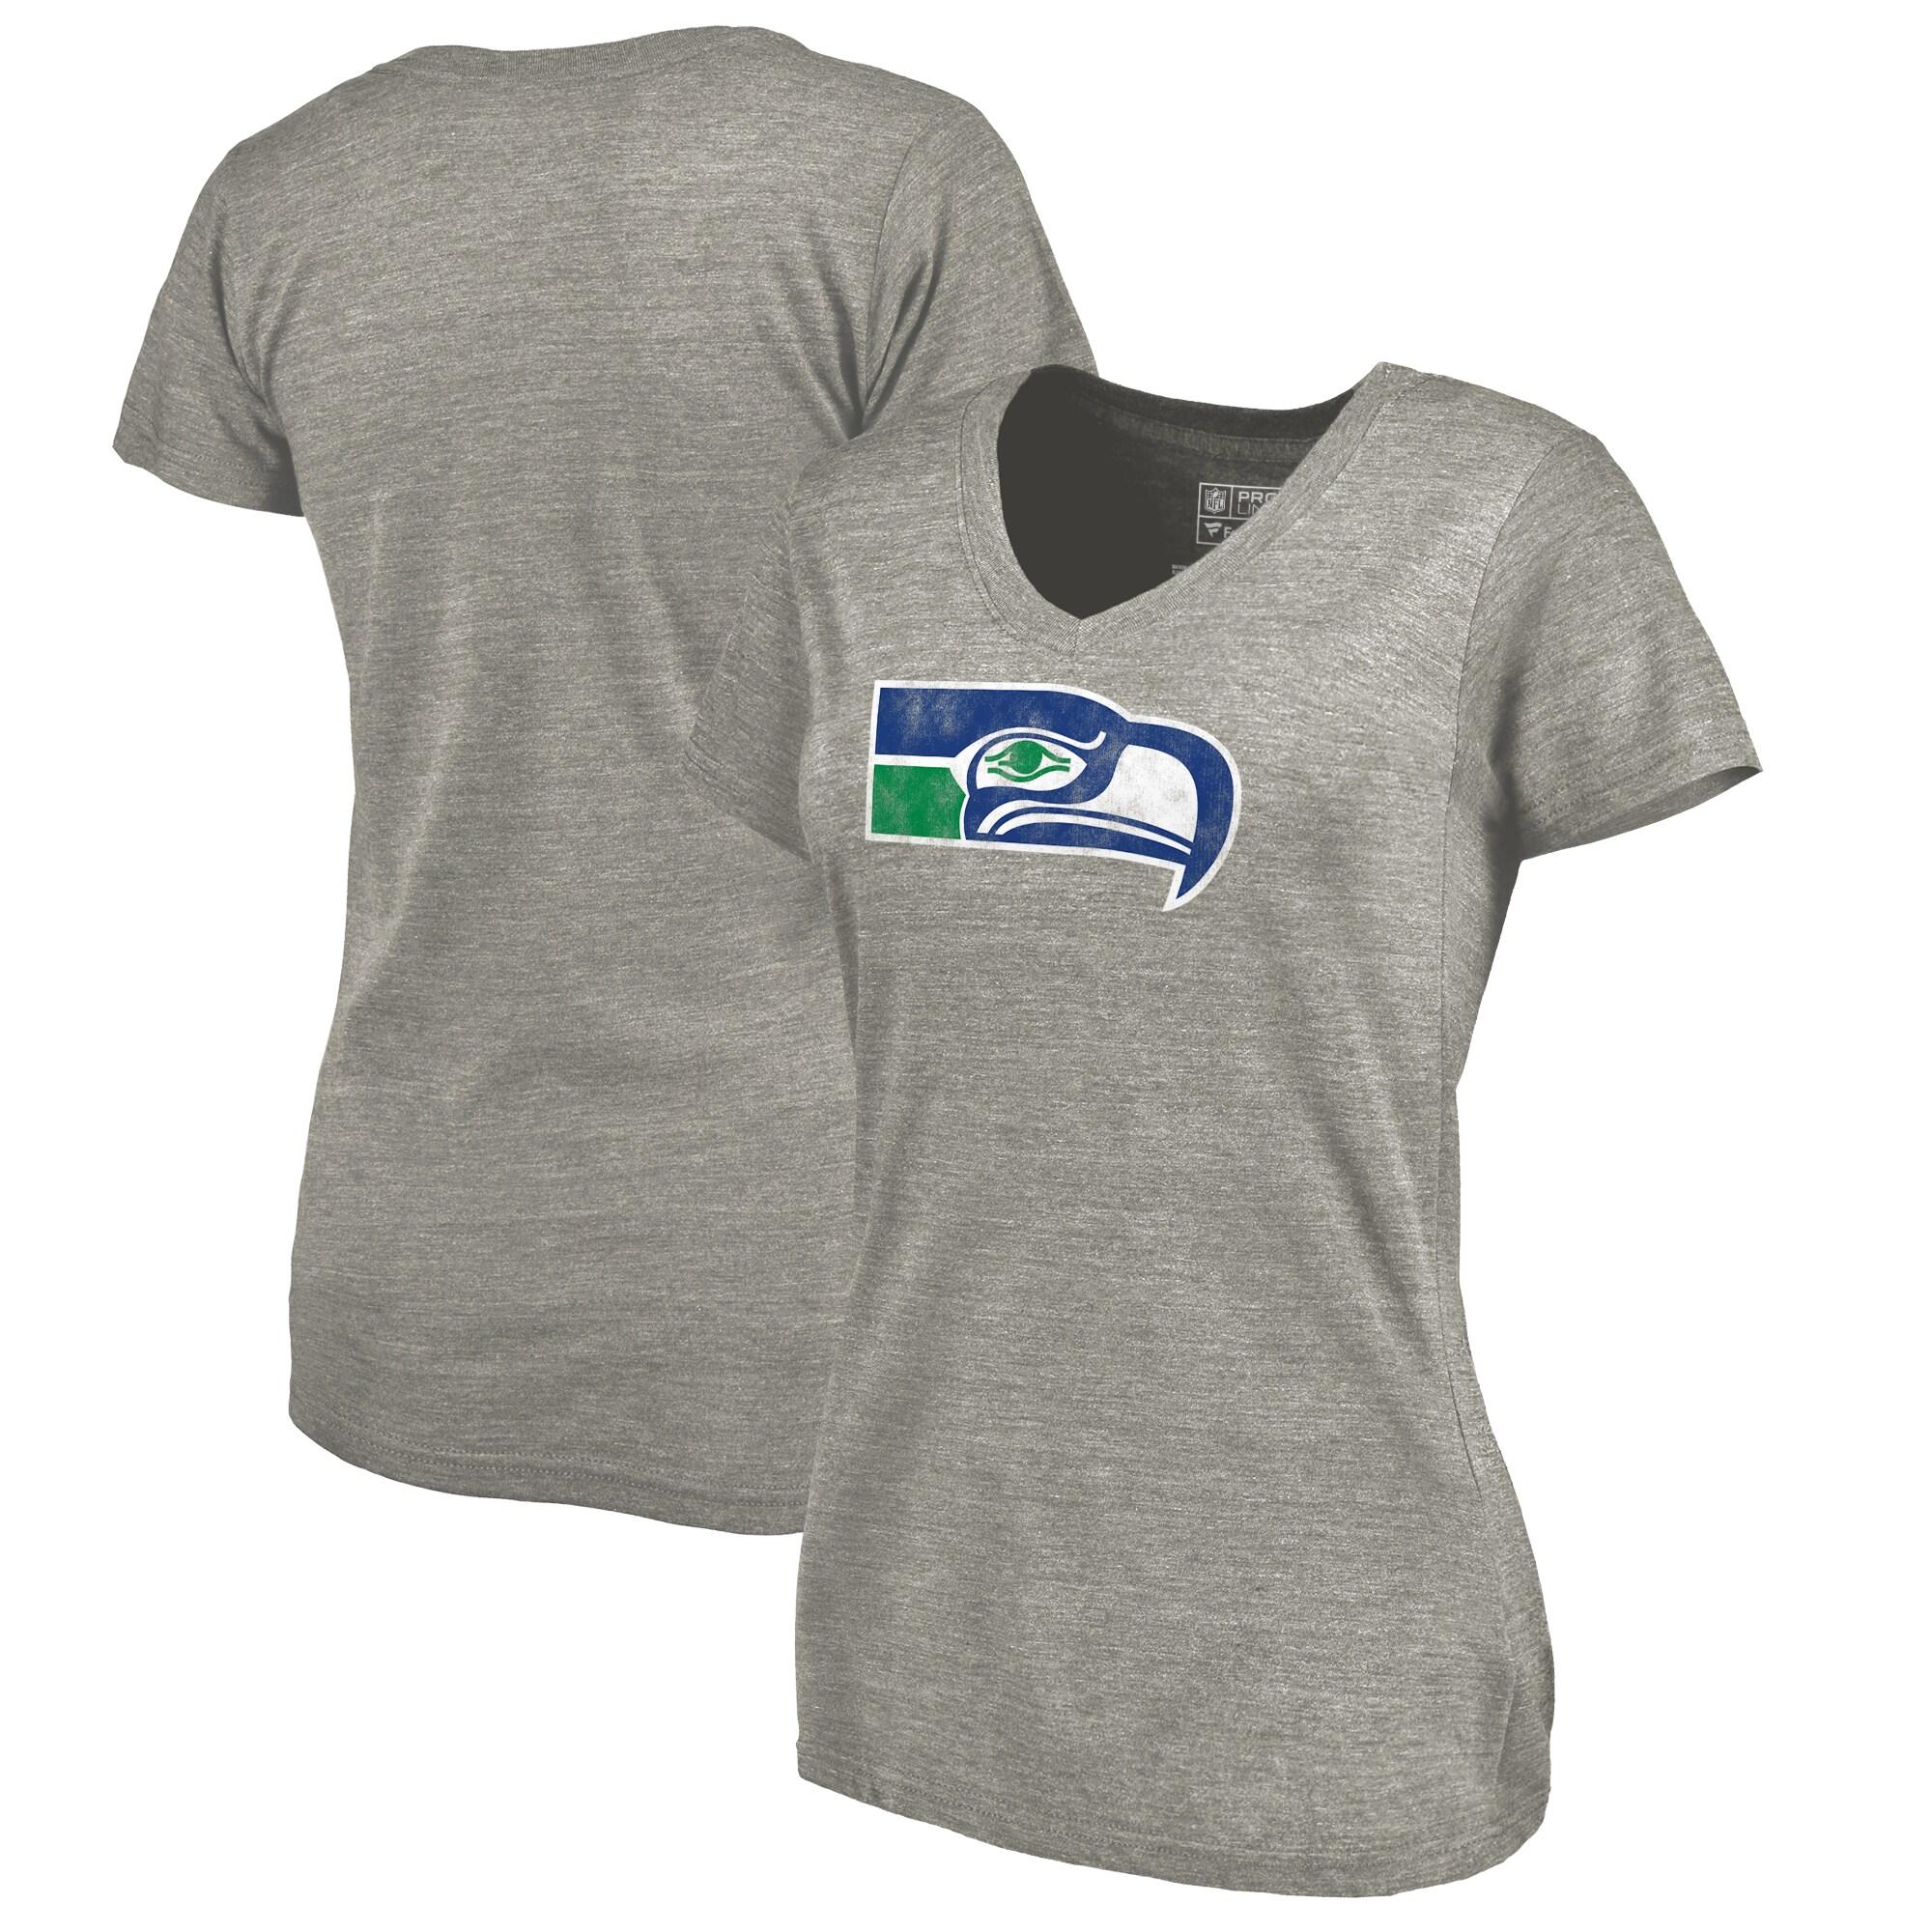 Seattle Seahawks NFL Pro Line by Fanatics Branded Women's Throwback Logo Tri-Blend V-Neck T-Shirt - Ash